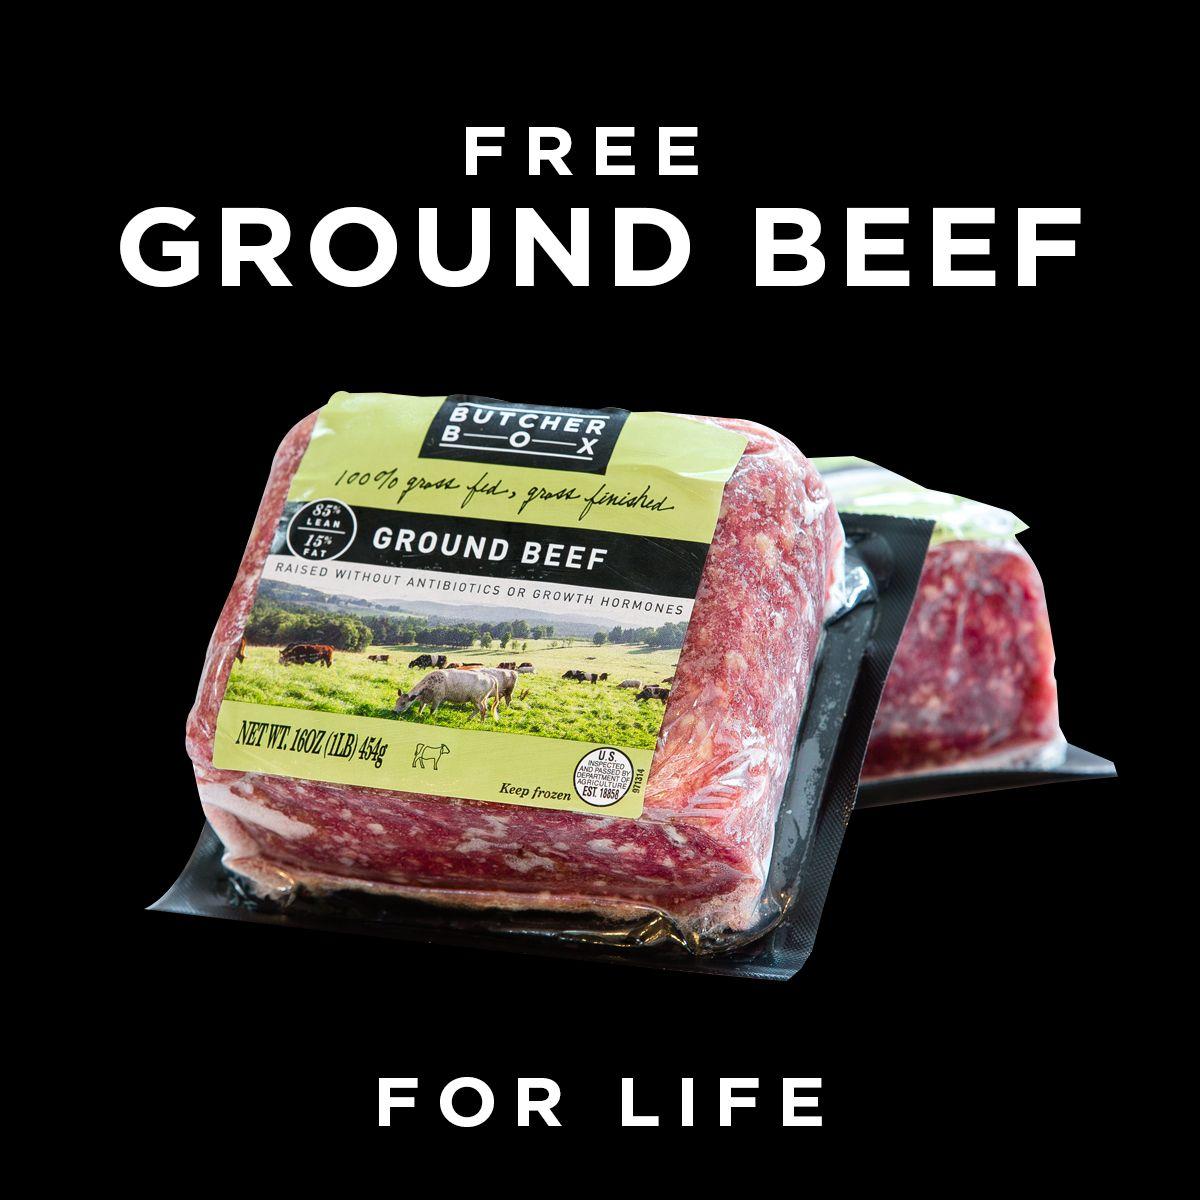 ground beef picture of frozen ground beef